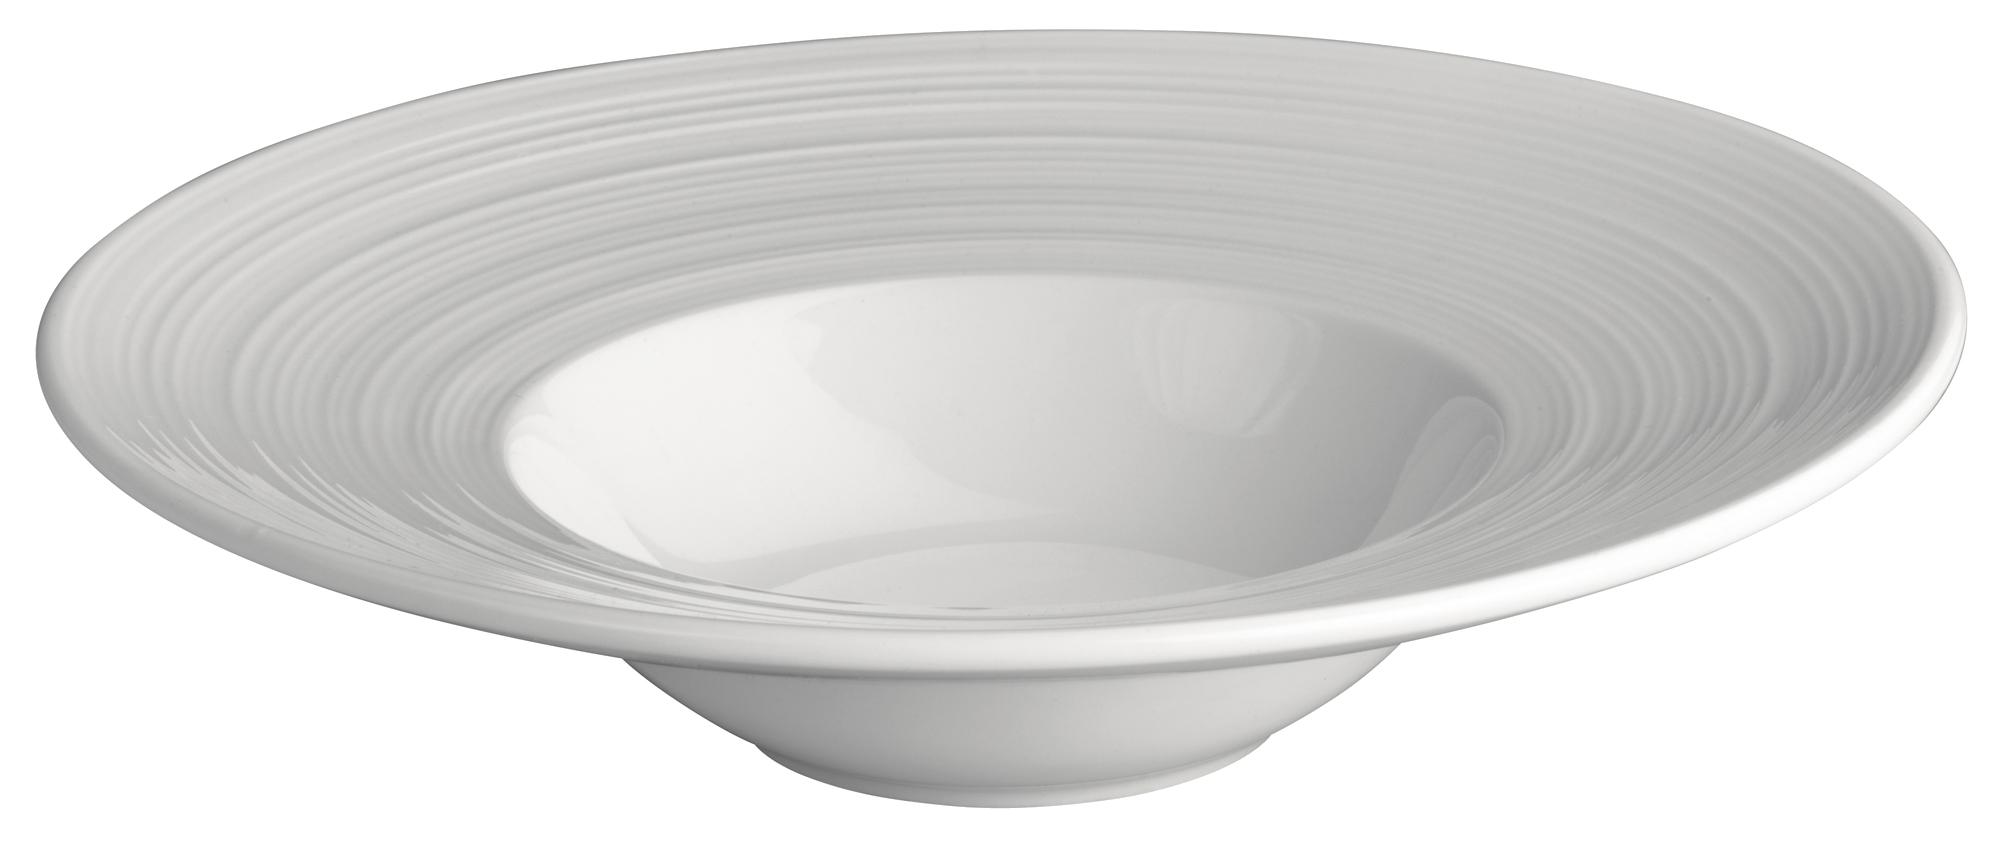 Winco WDP022-102 china, bowl,  0 - 8 oz